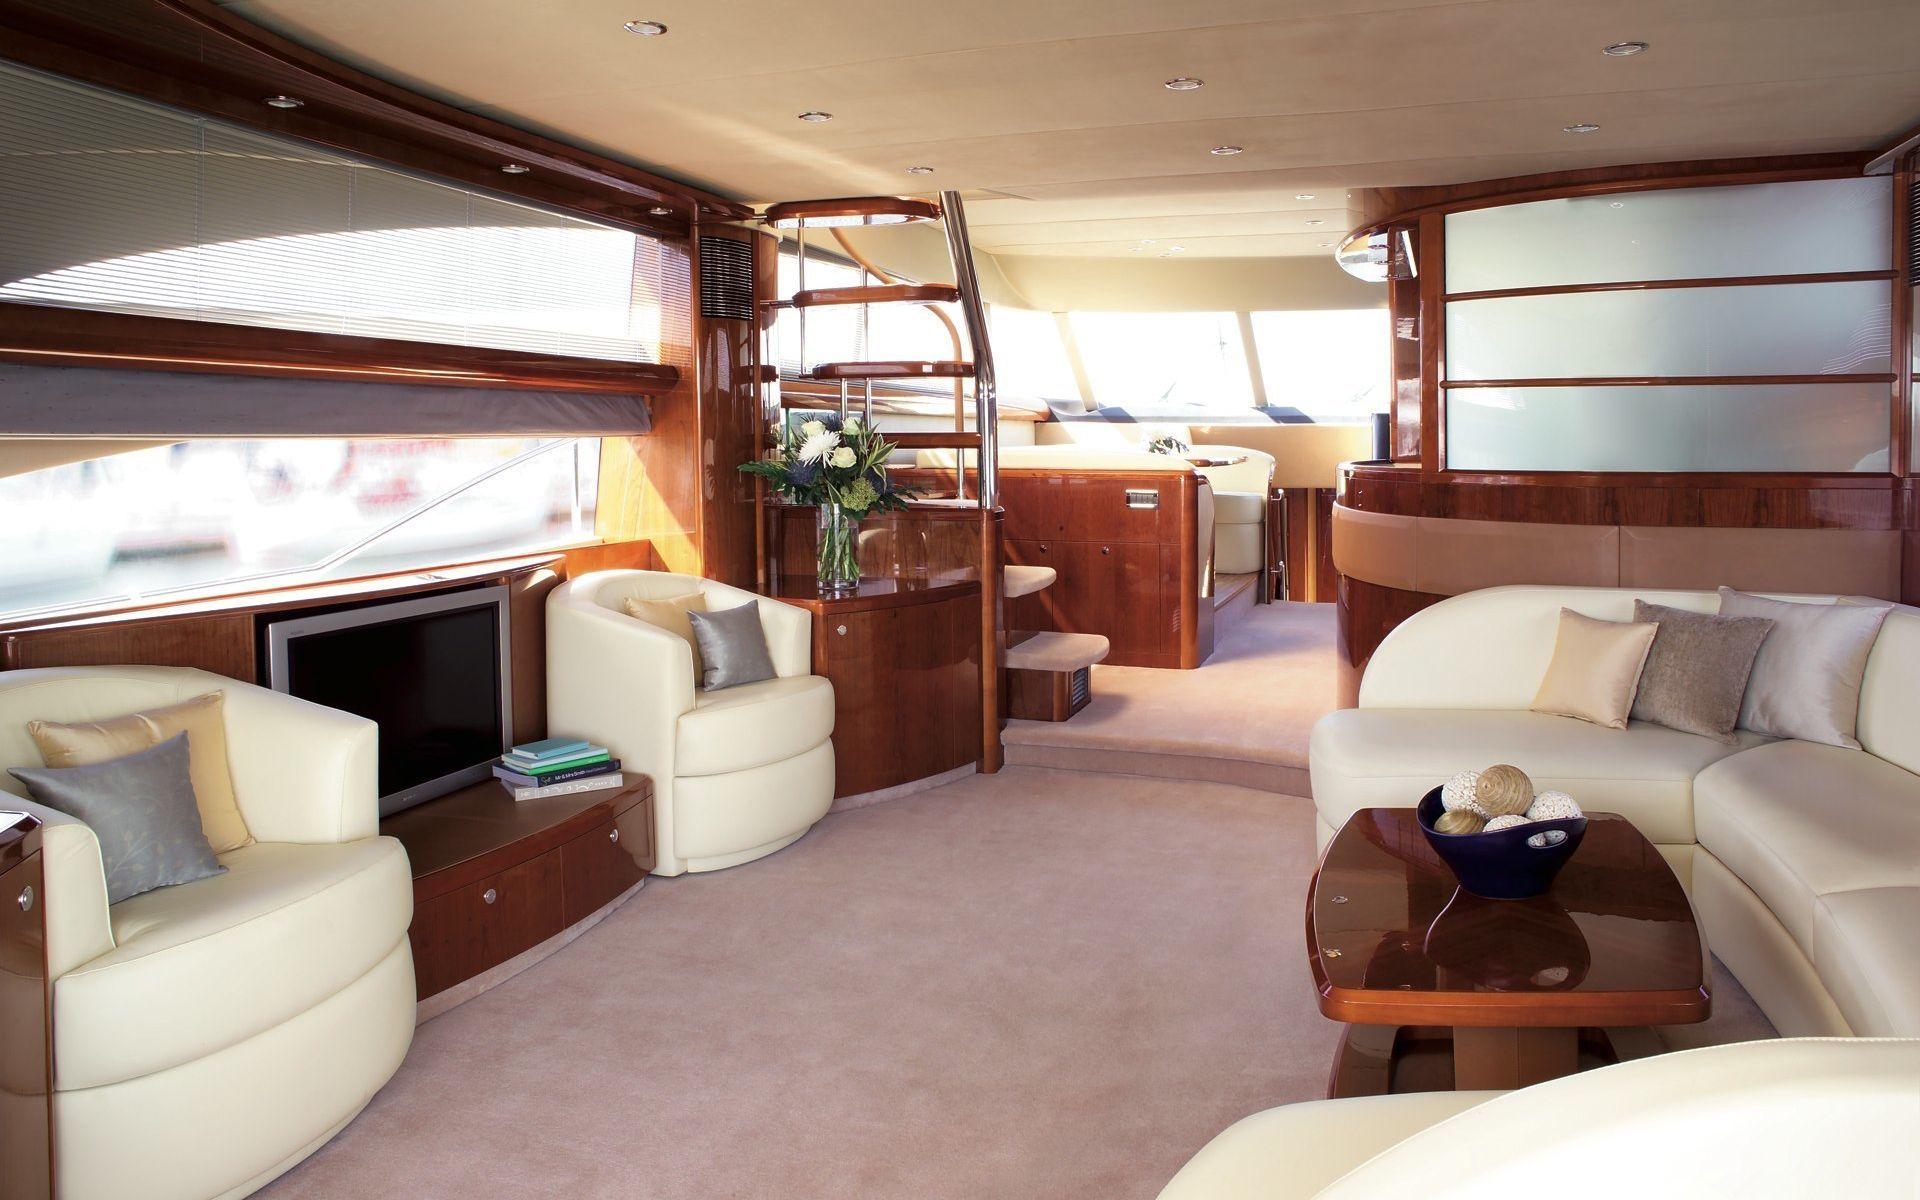 Viking Yacht 70' - Interior | Boat | Yacht interior, Boat